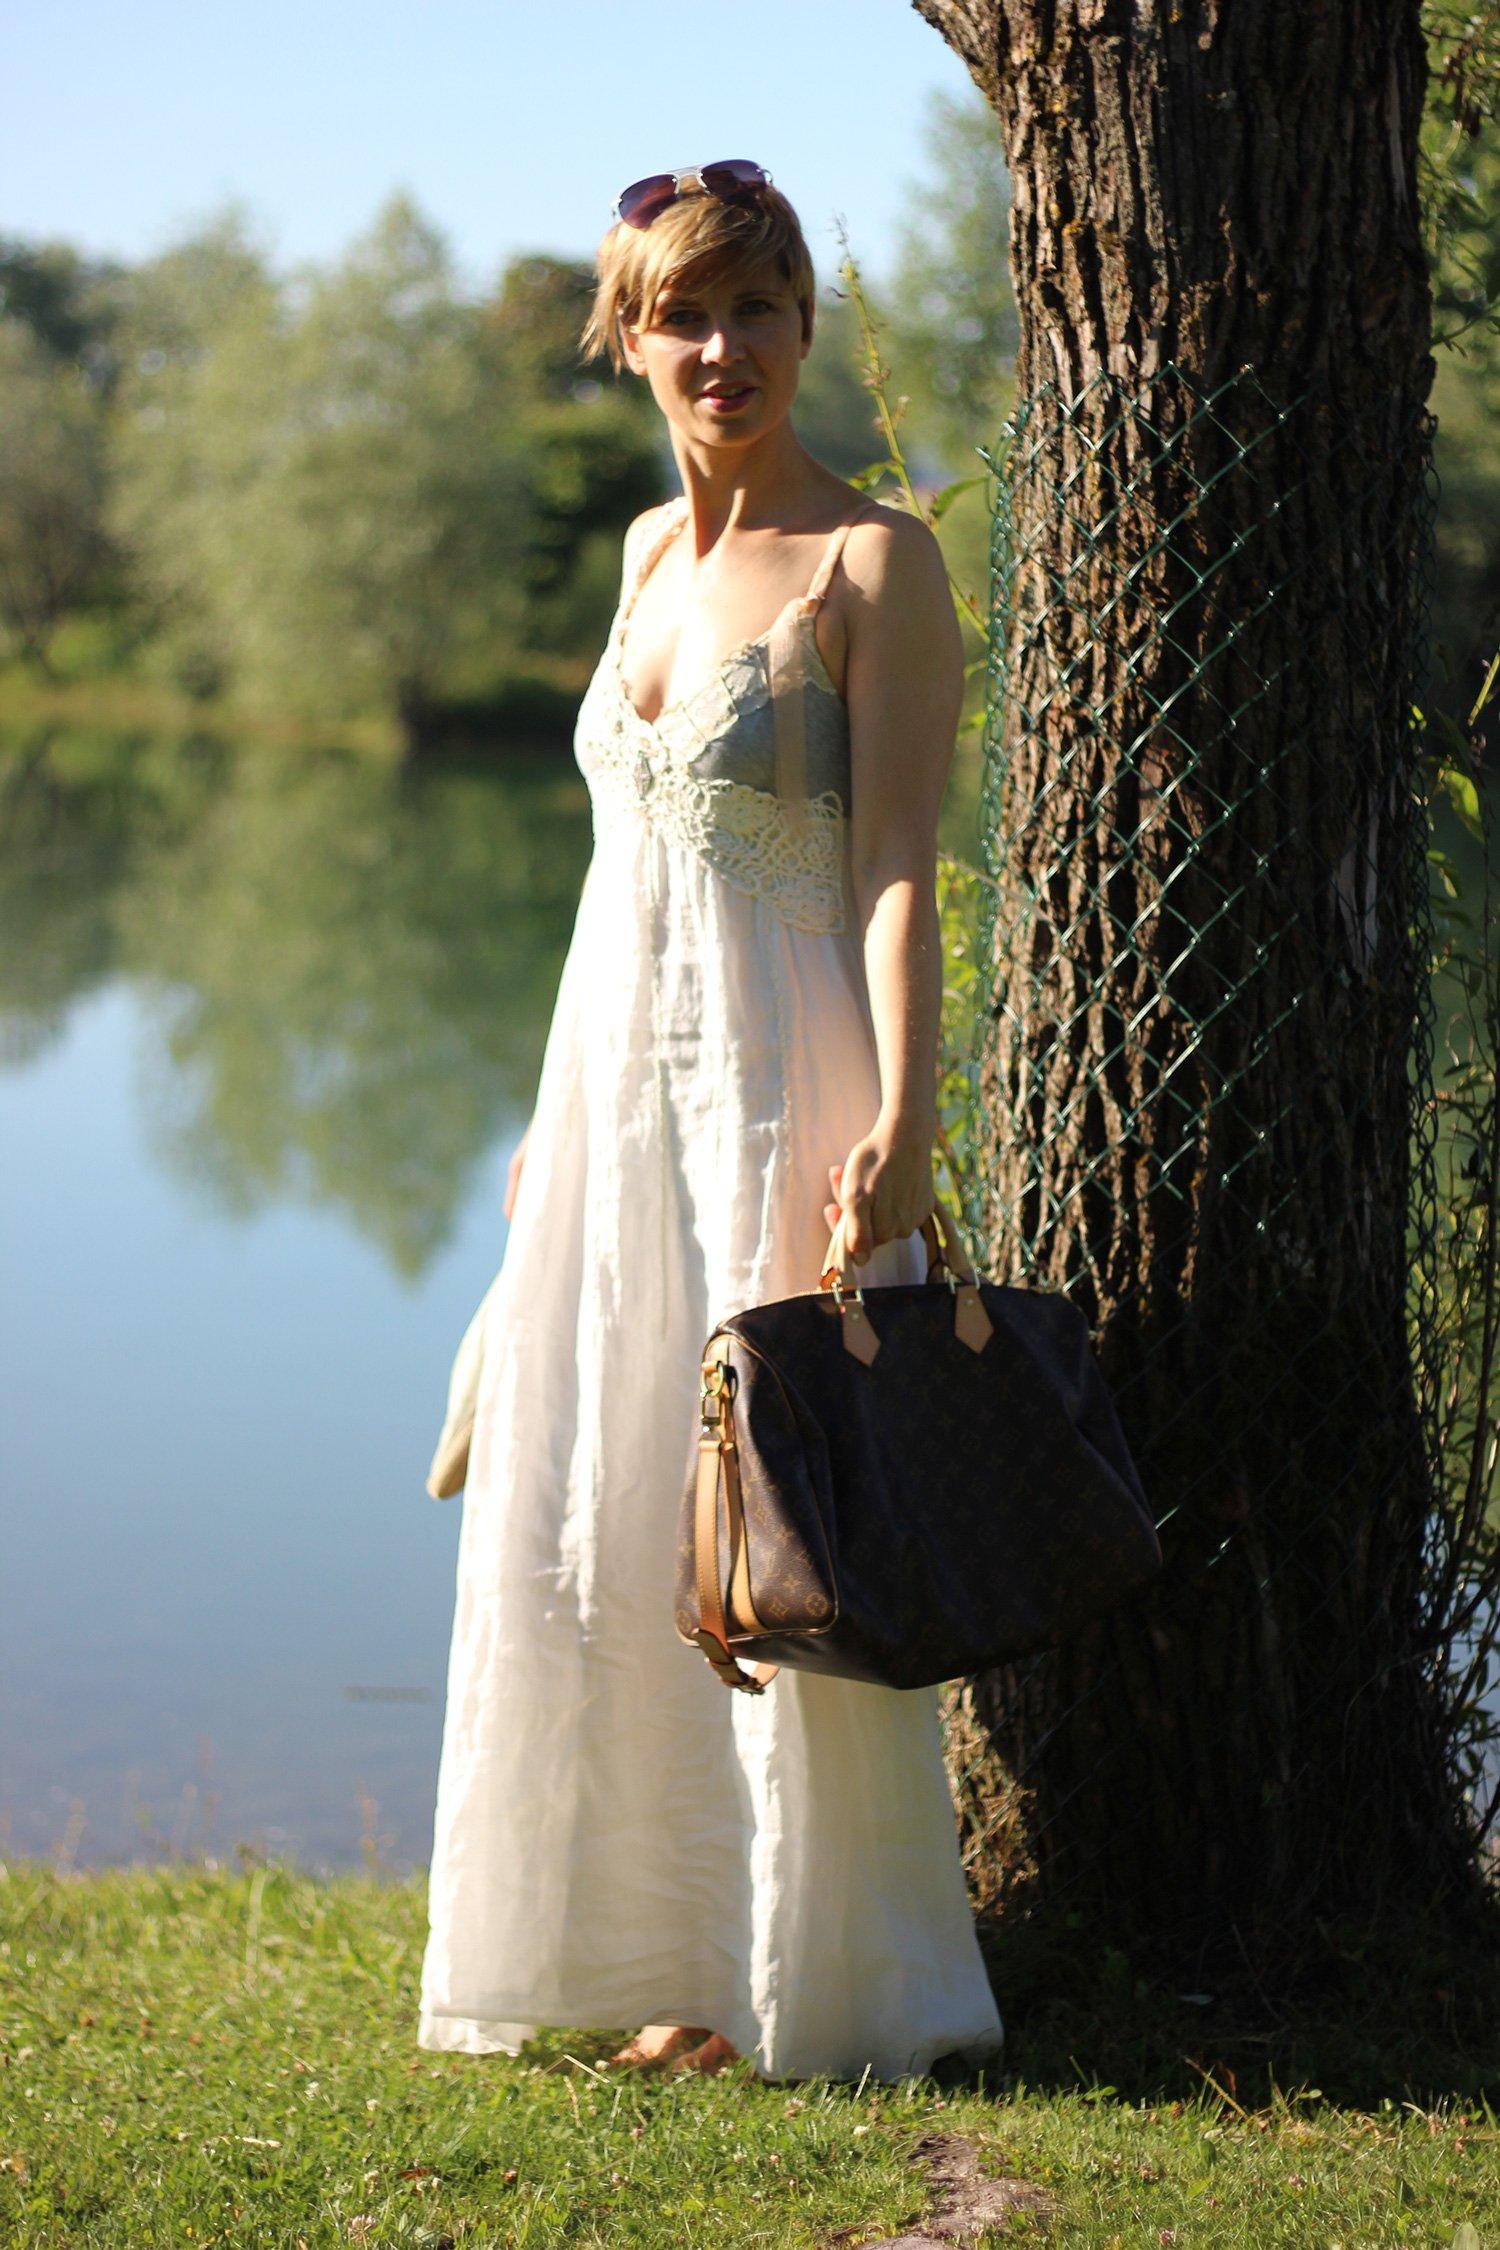 IMG_7198a_ElisaCavaletti_langes_Sommerkleid_summerdress